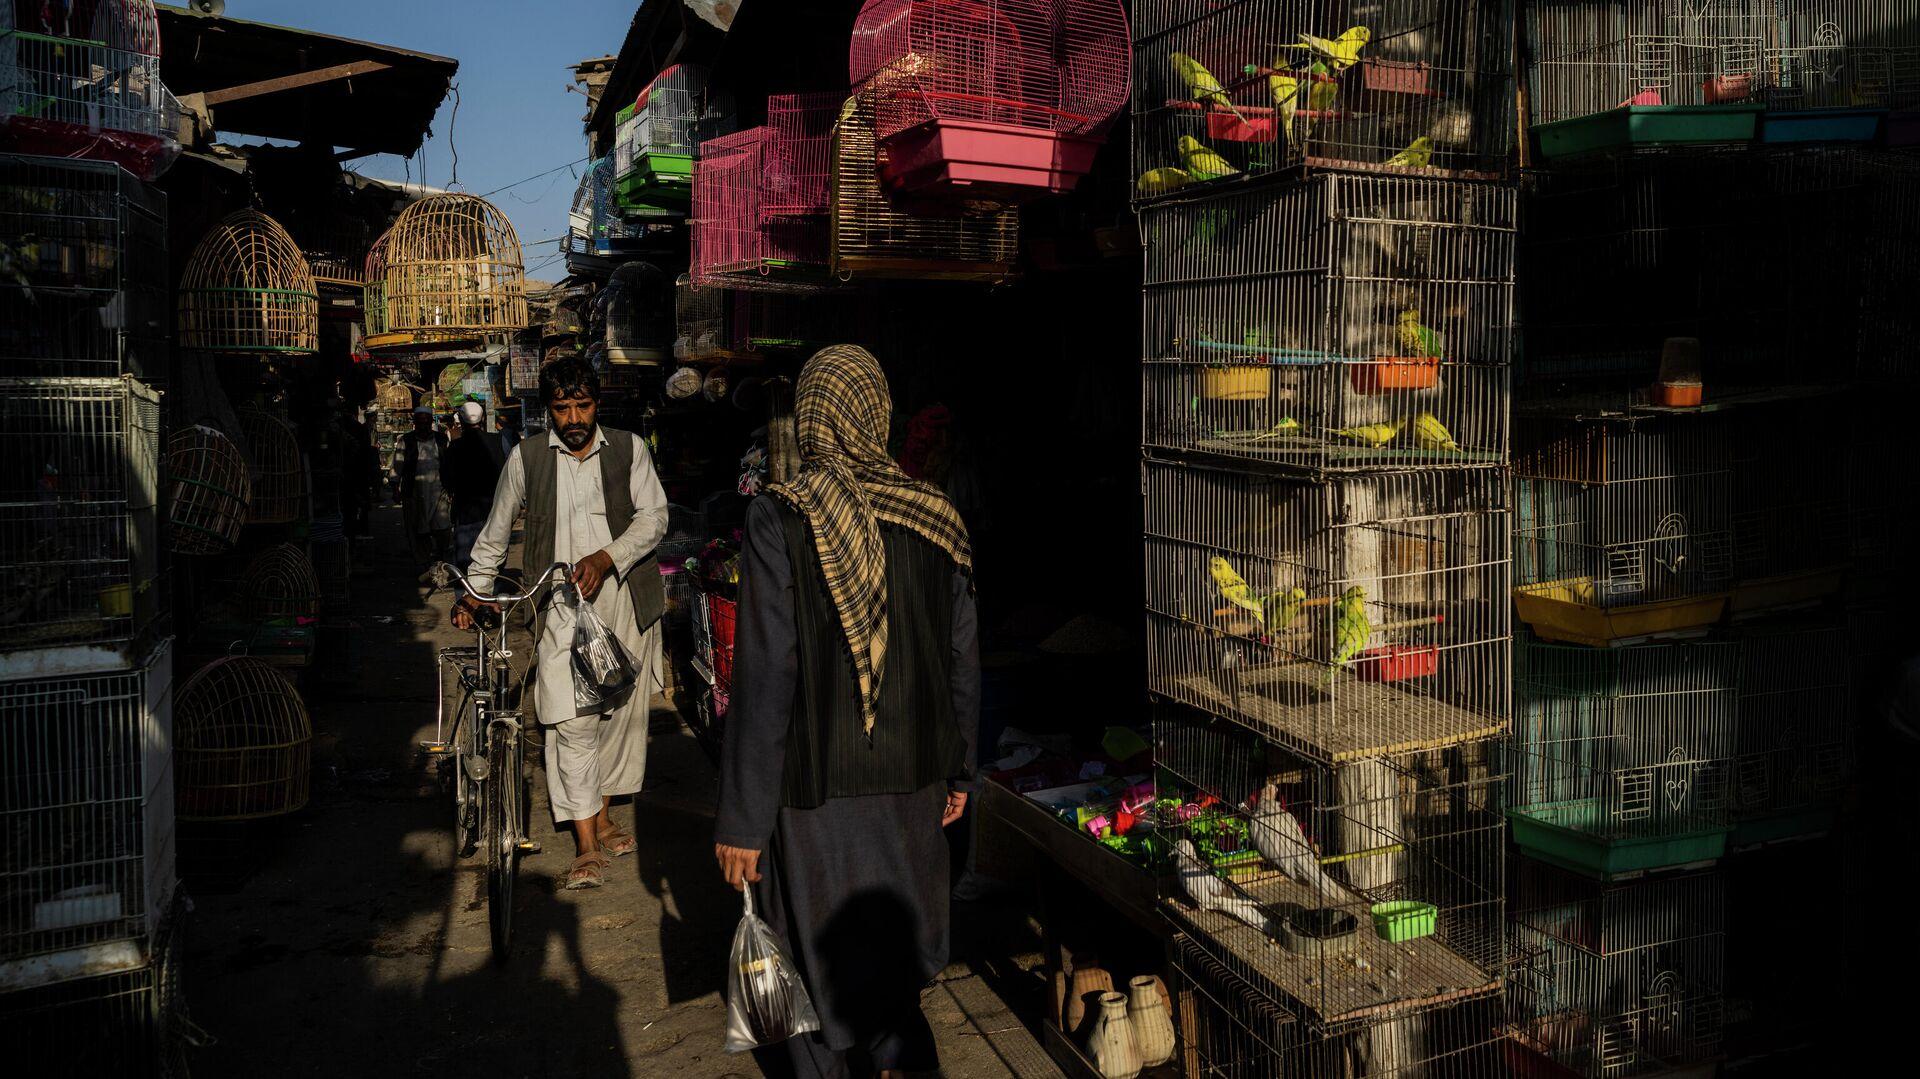 Мужчина на рынке в Кабуле, Афганистан  - РИА Новости, 1920, 14.10.2021